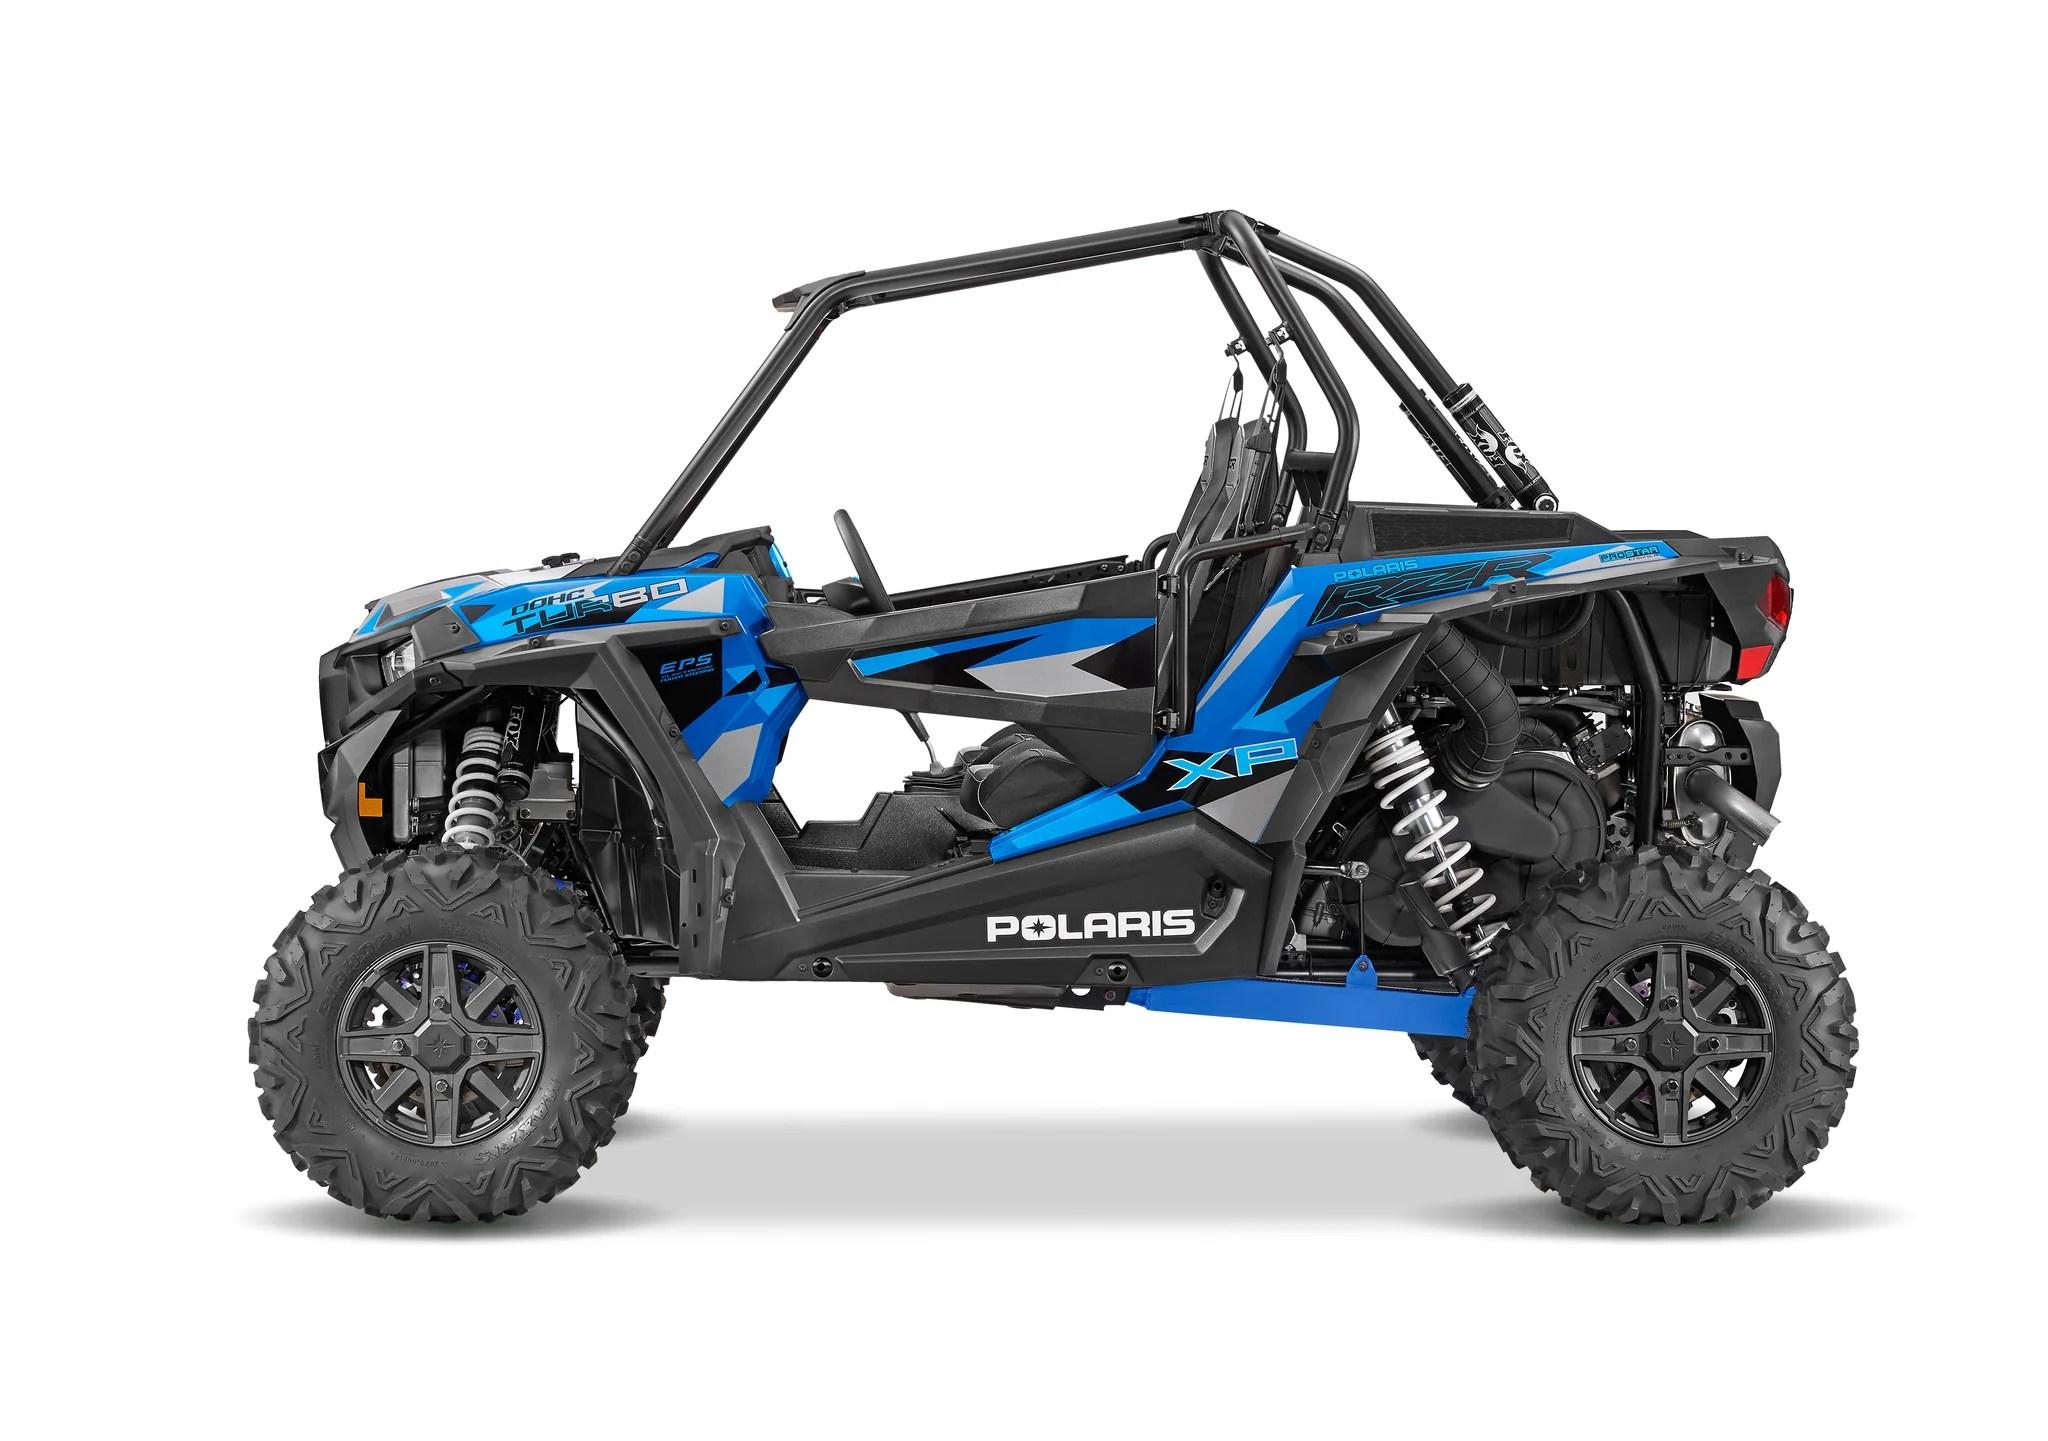 hight resolution of ryco street legal kit for polaris rzr turbo s turbo 1000 900 2015